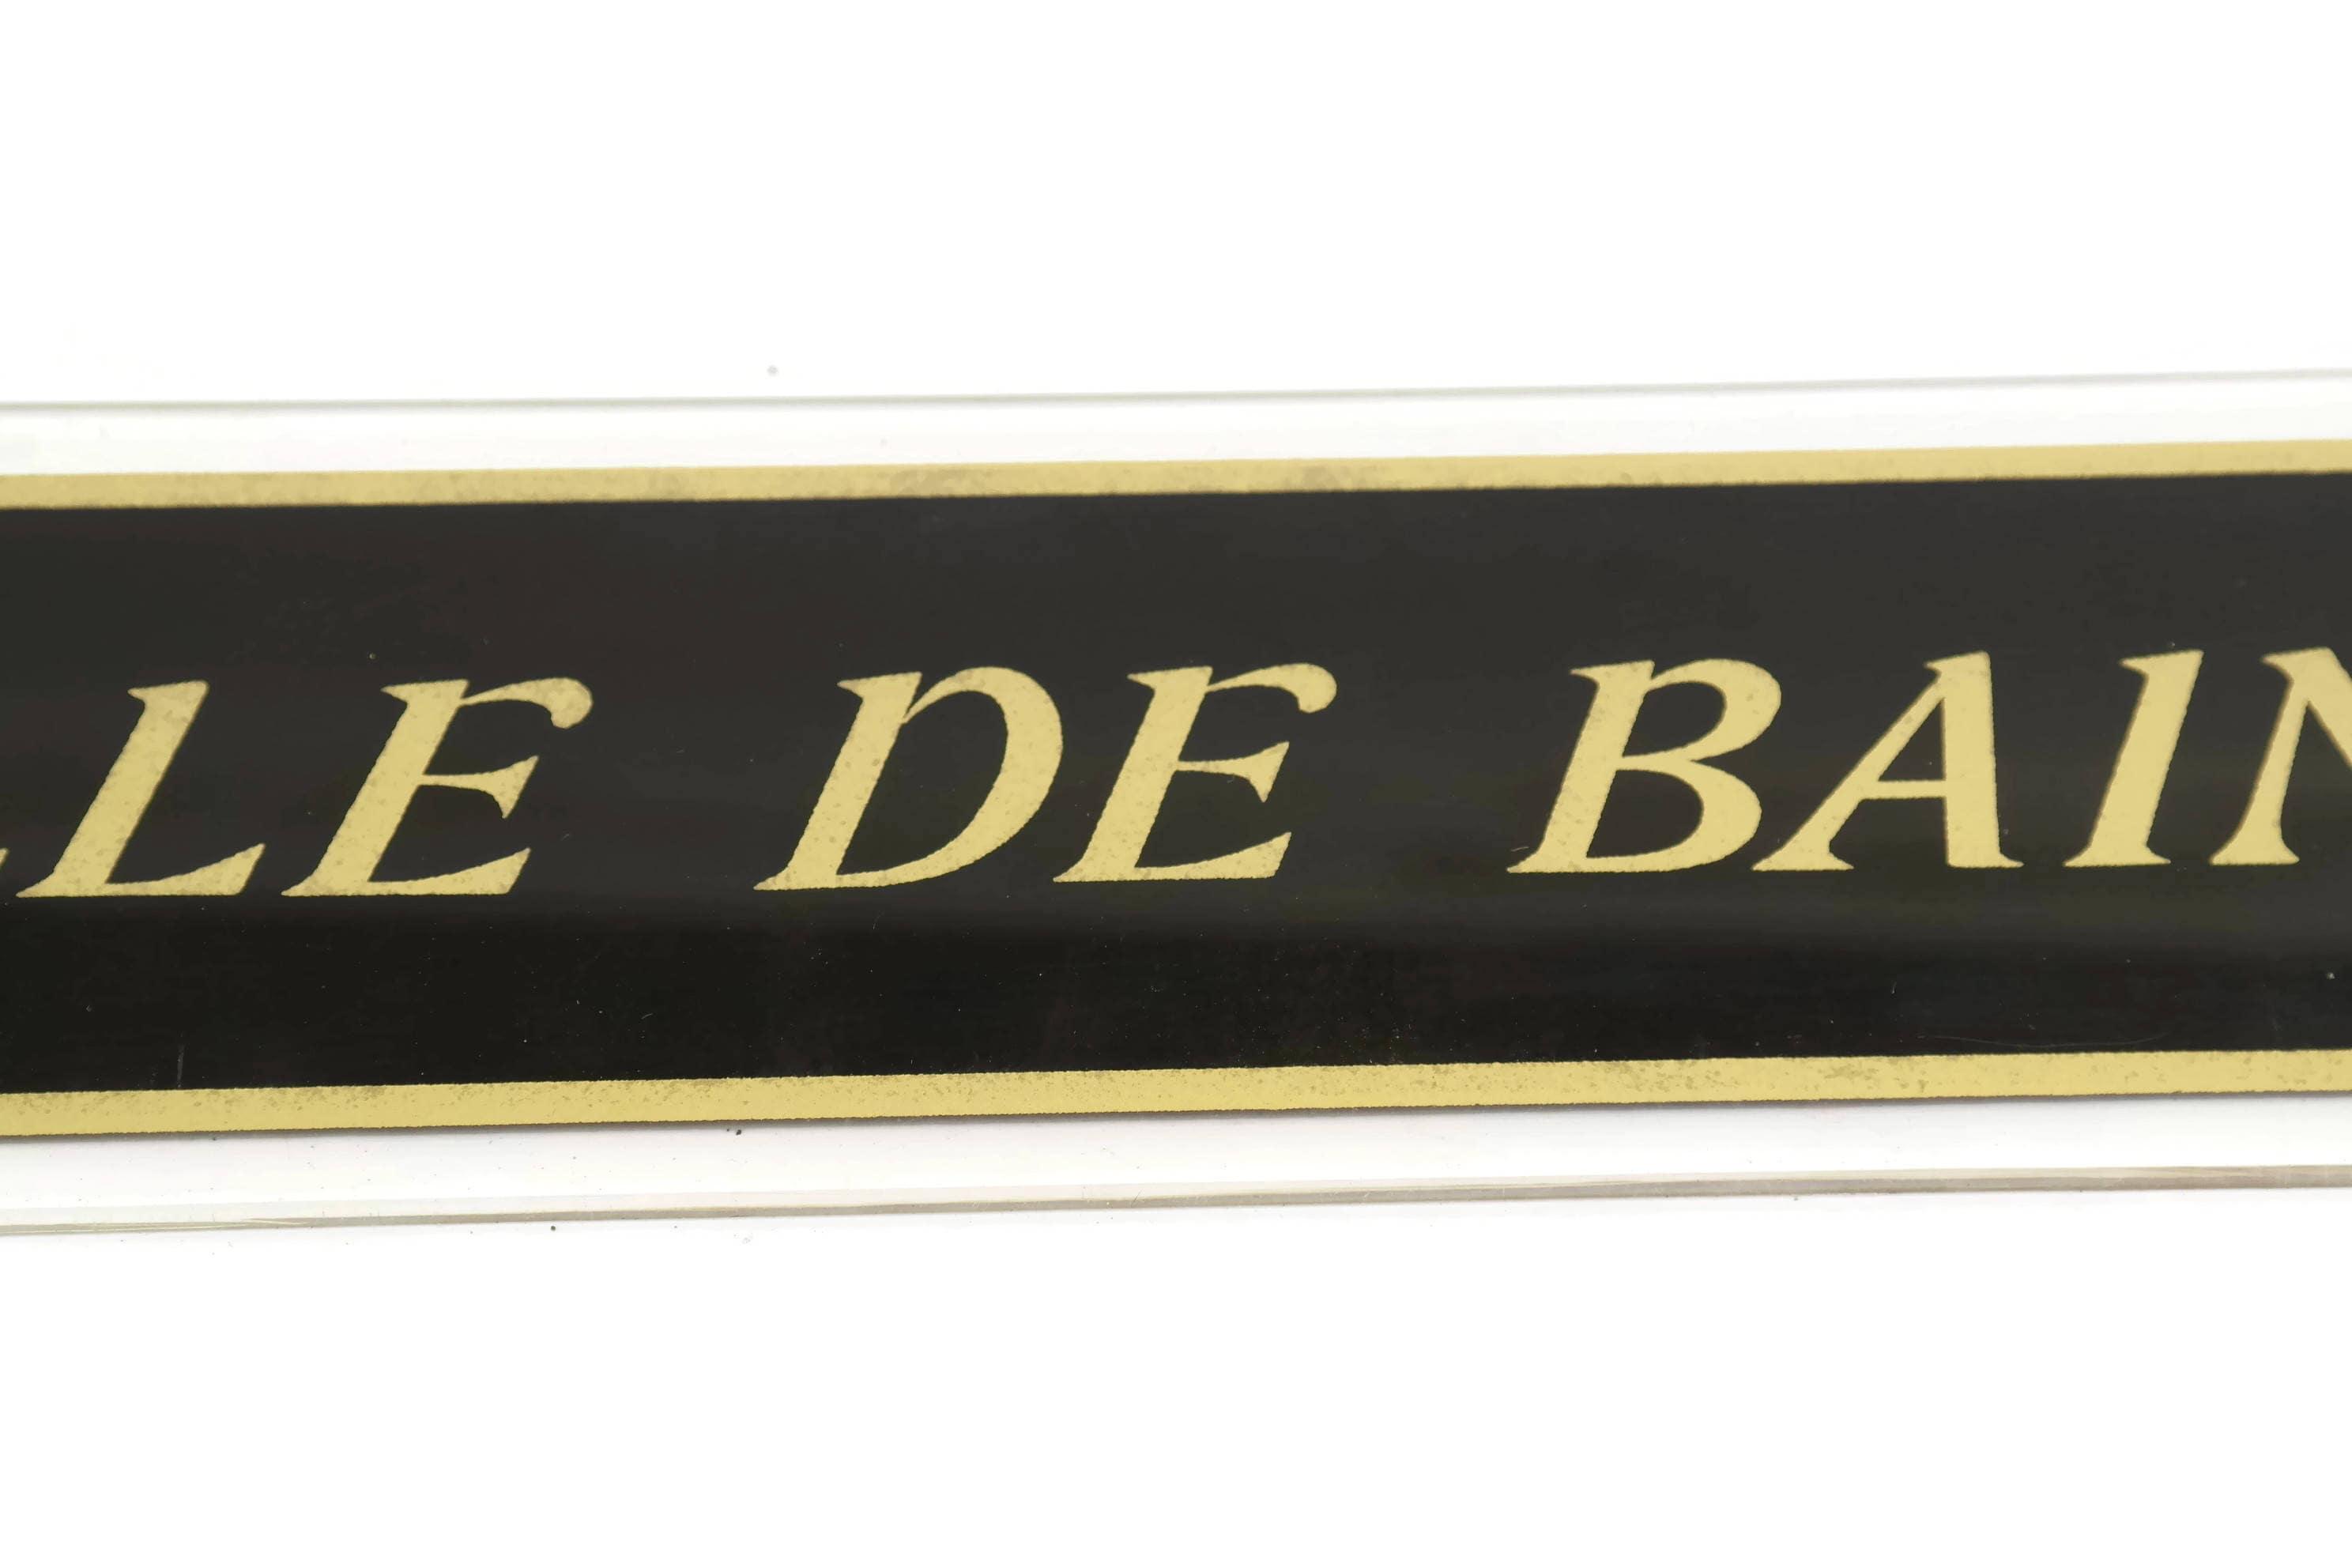 Lambris Pvc Salle De Bain Bricoman ~ French Bathroom Door Sign Vintage Black And Gold Salle De Bain Sign